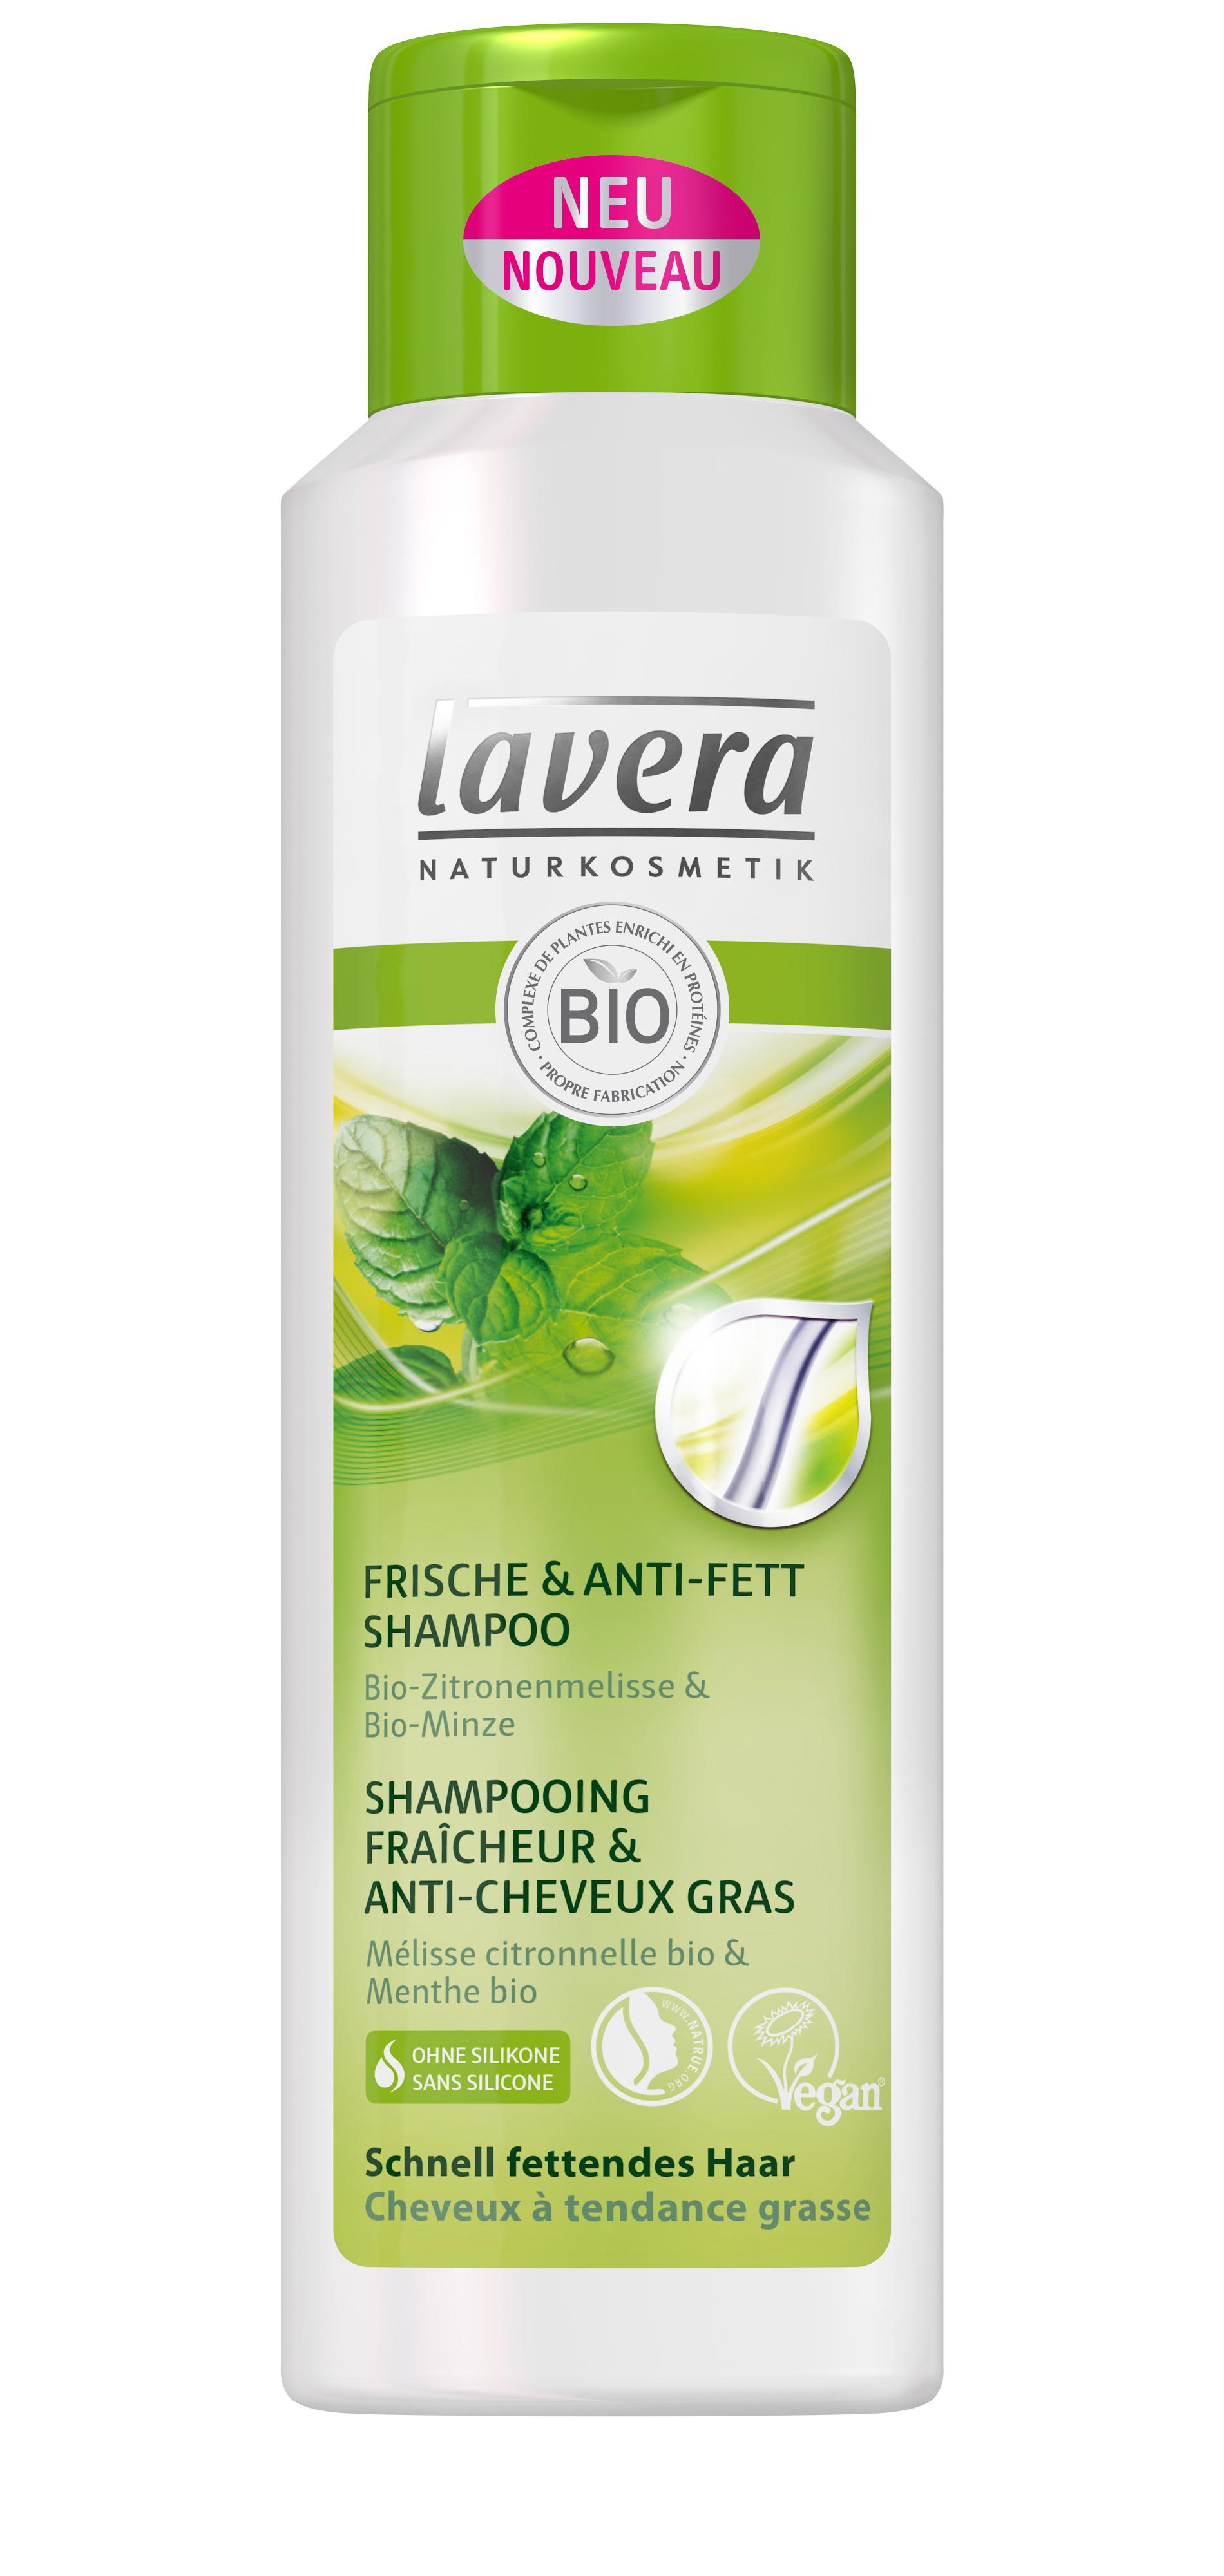 lavera shampoing hair fra cheur et anti cheveux gras 250ml boutique bio. Black Bedroom Furniture Sets. Home Design Ideas